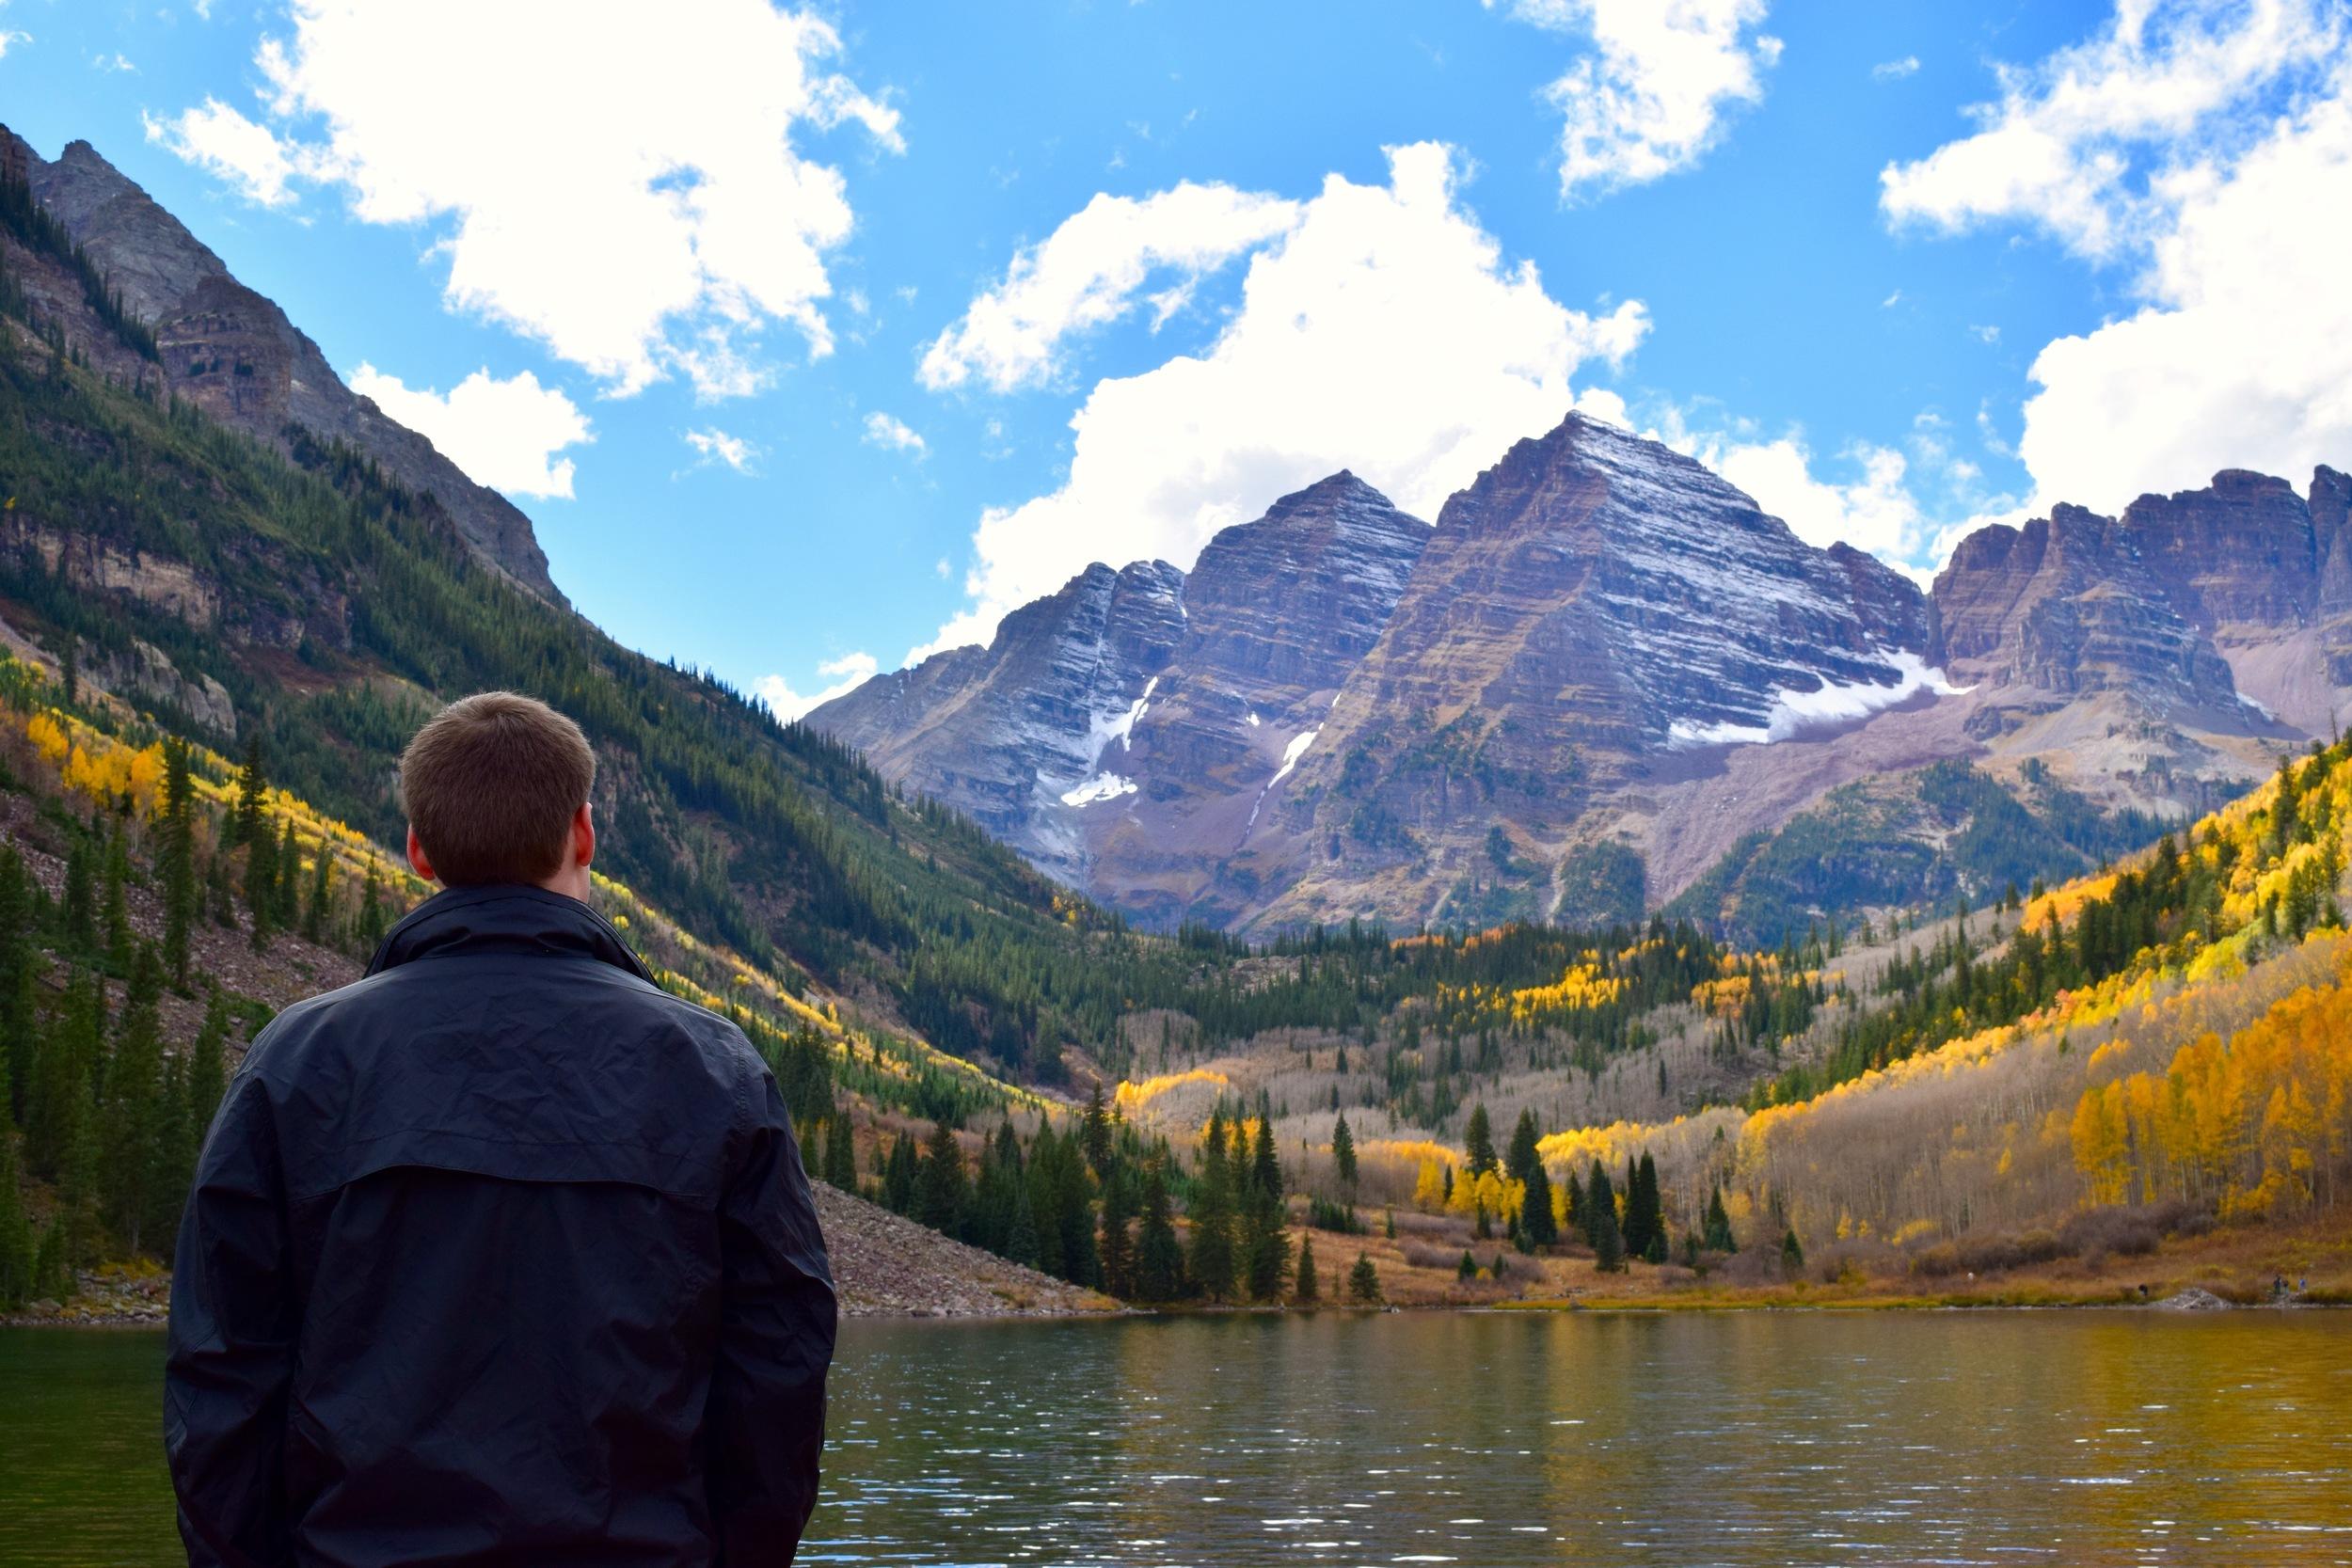 Logan looking across Maroon Lake at the Maroon Bells (aka the Deadly Bells)